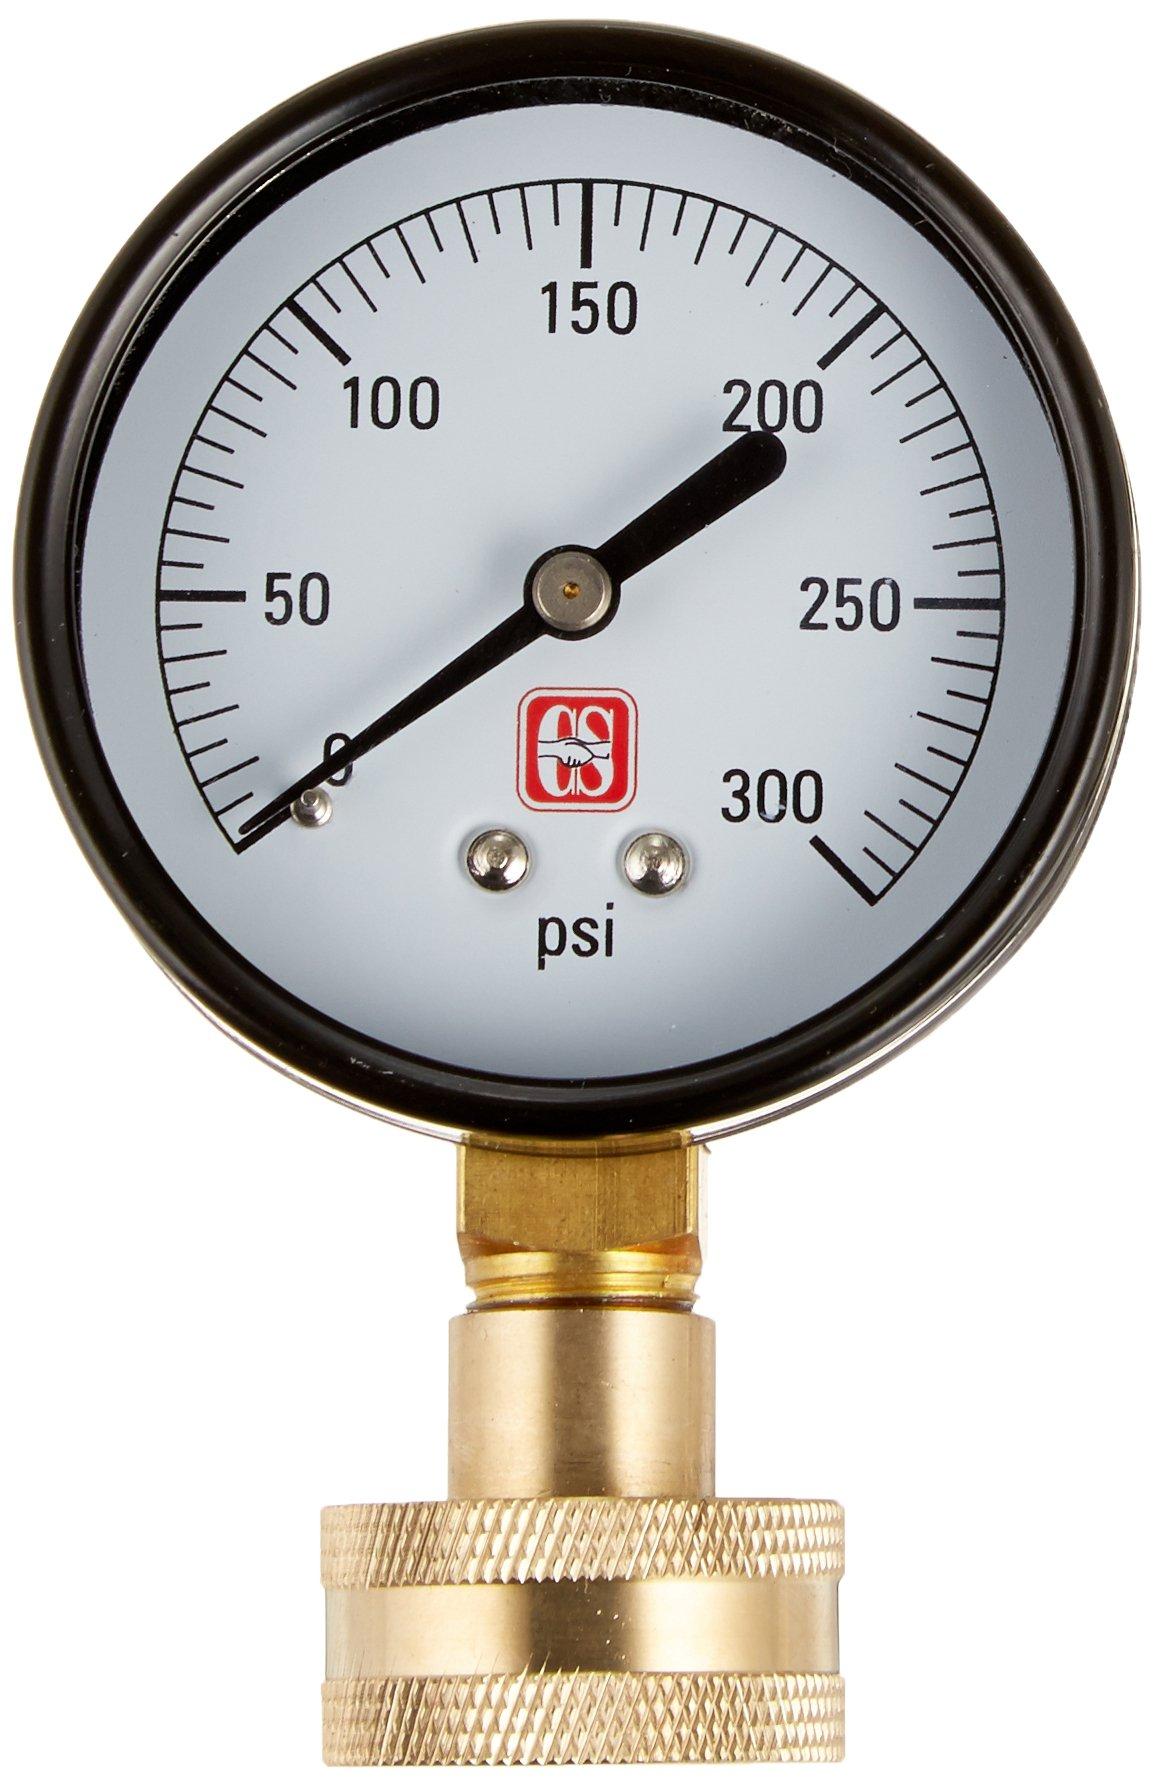 EZ-FLO 45169 Water Pressure Test Gauge